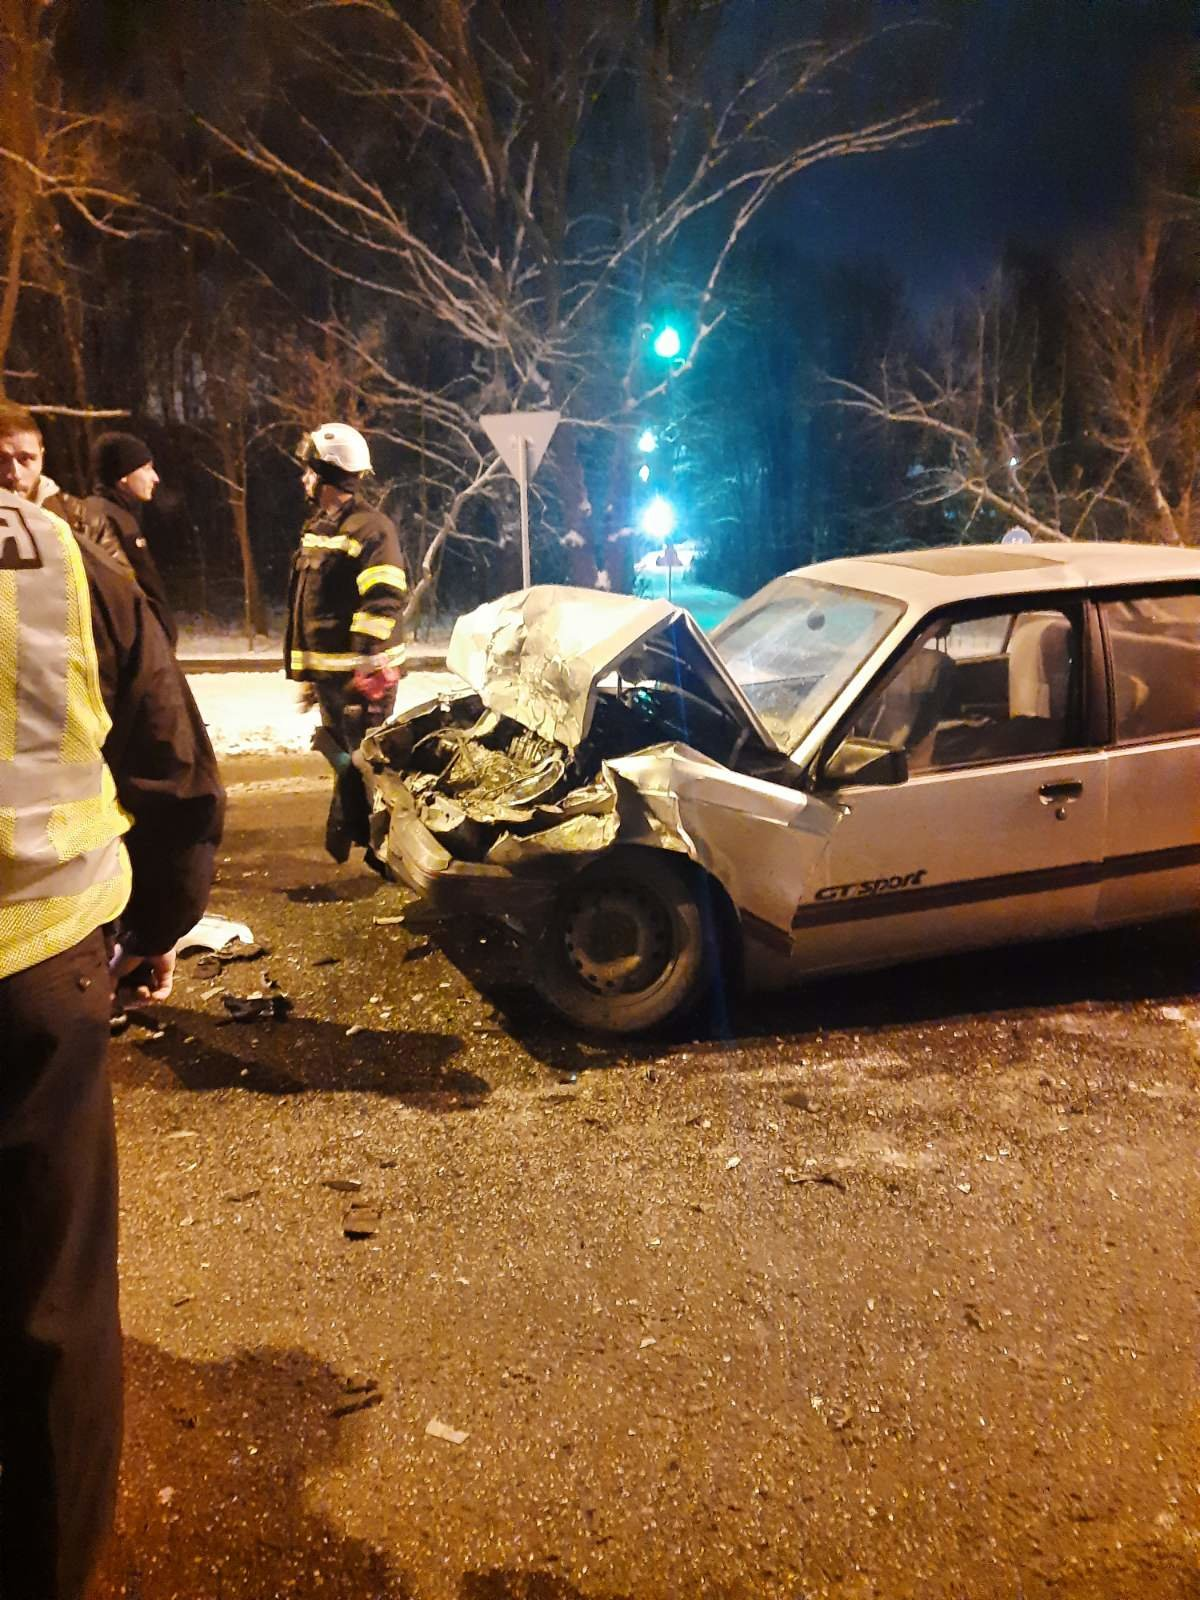 На трассе в Харькове спасатели вытащили авто, слетевшее в кювет, - ФОТО, фото-2